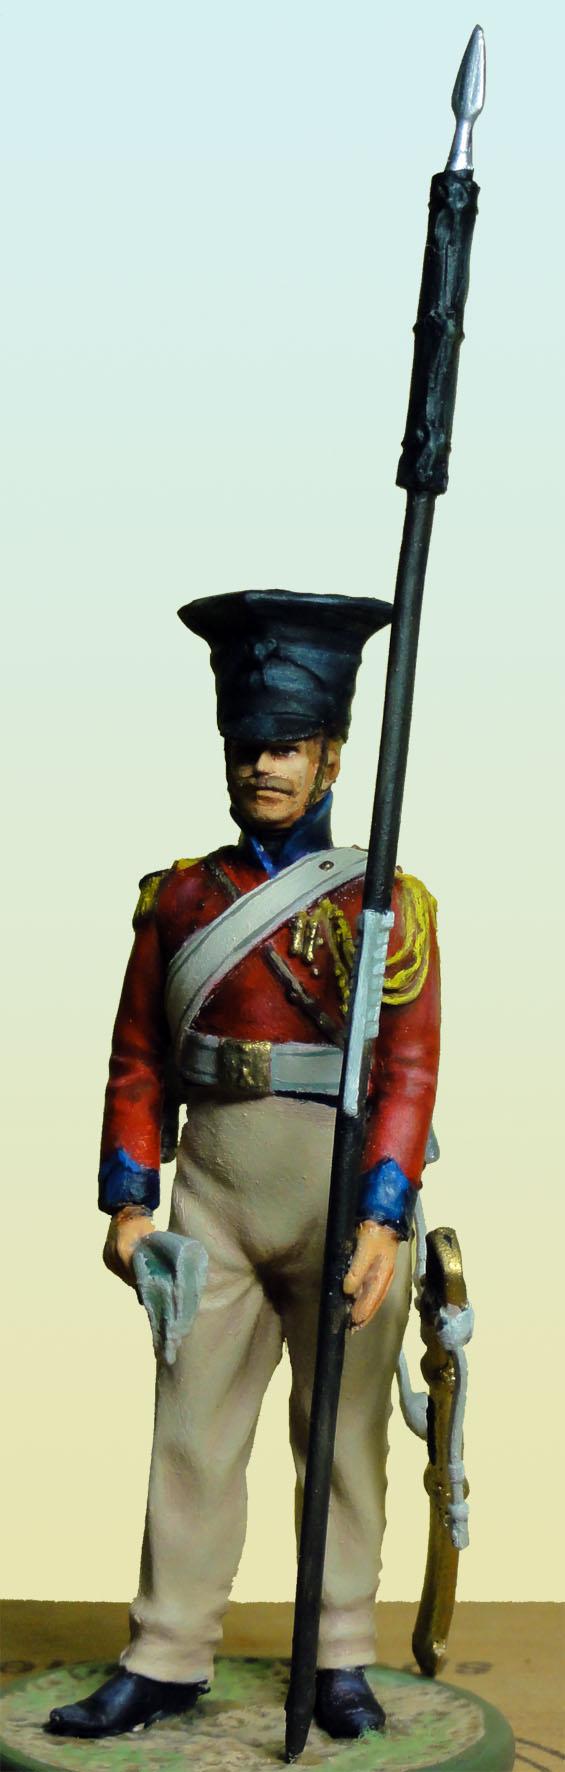 Vitrine de MarcM, Murat en amiral napolitain - Page 3 Lancie12